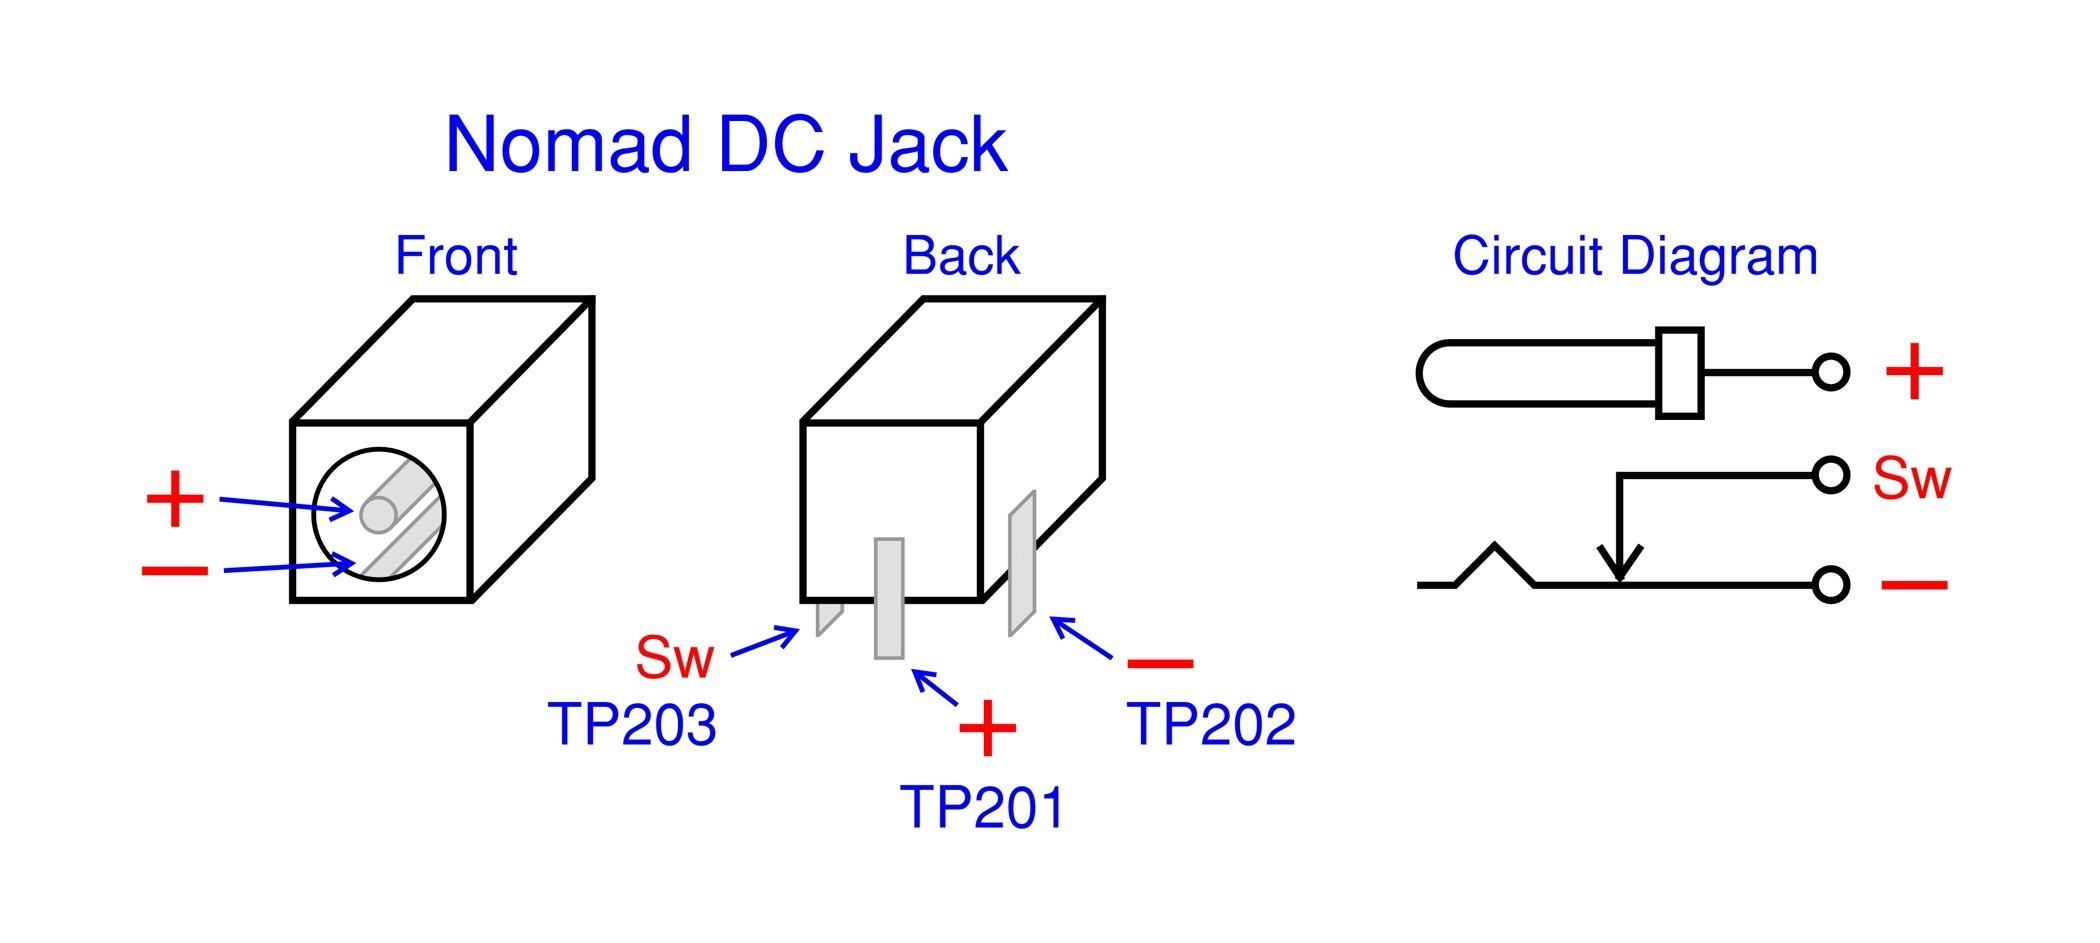 Laptop Dc Jack Wiring Diagram Electrical Diagrams For Power Circuit And Hub U2022 Molex